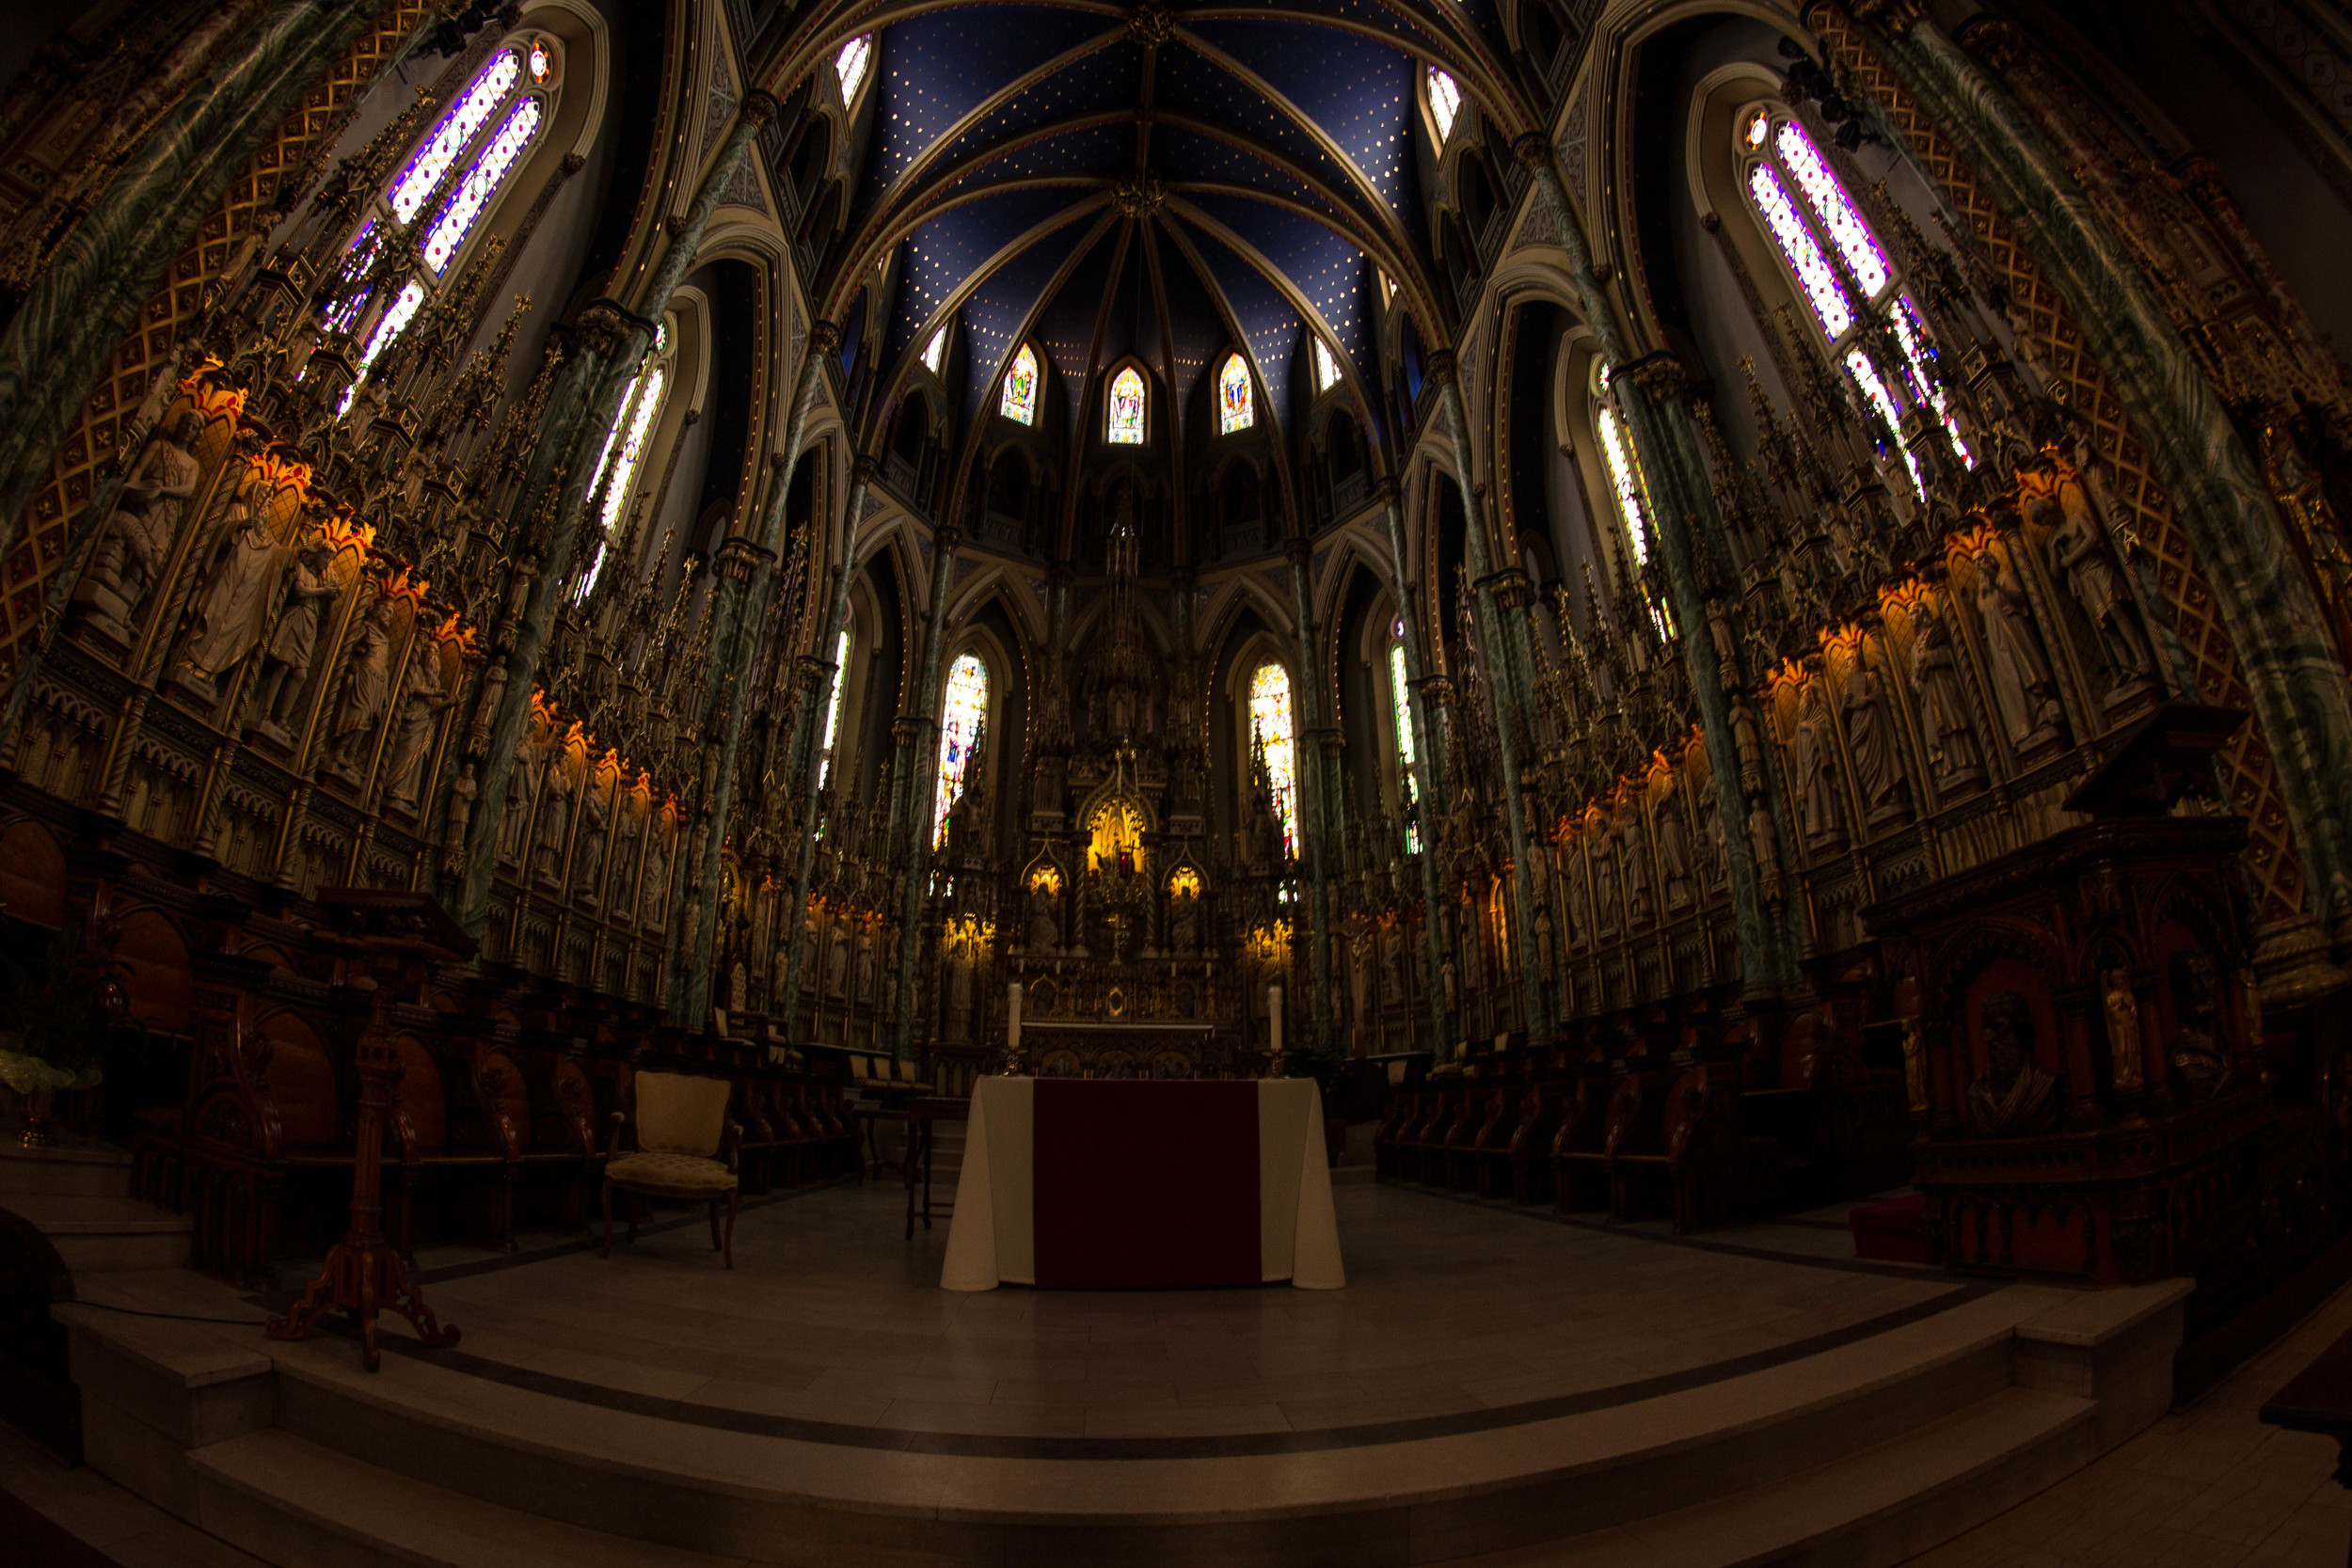 Ottawa_2015_0316_0099.jpg